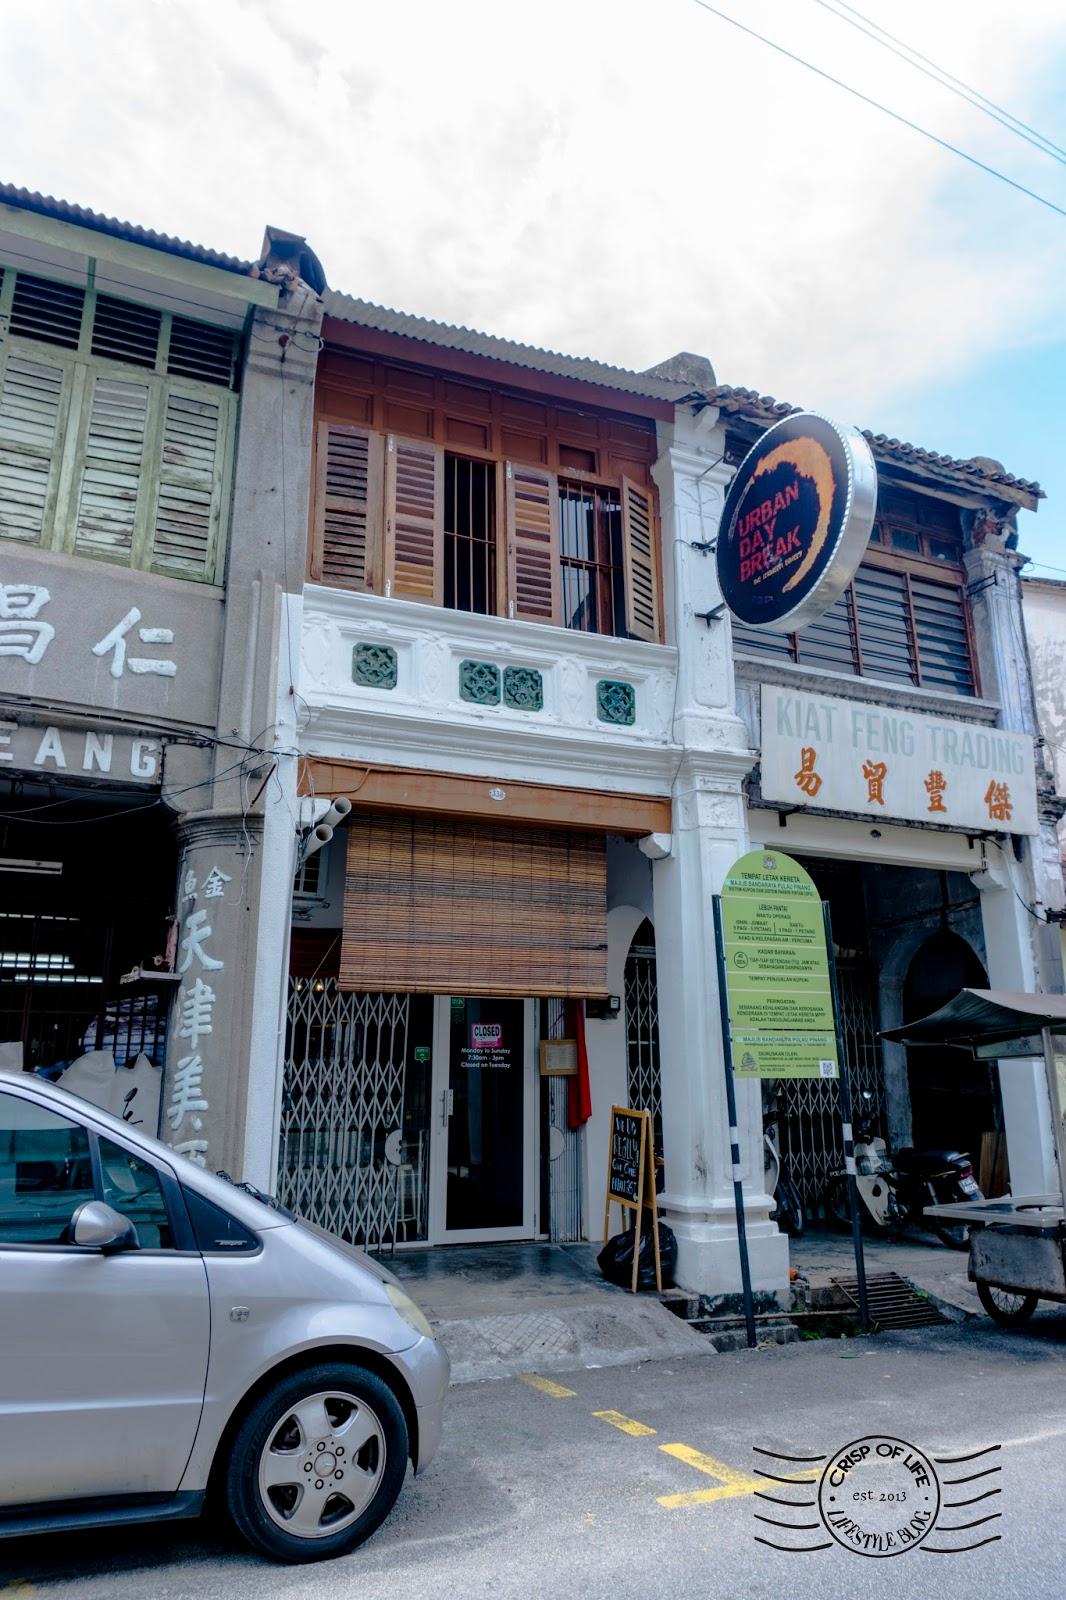 urban daybreak @ beach street, georgetown penang - crisp of life